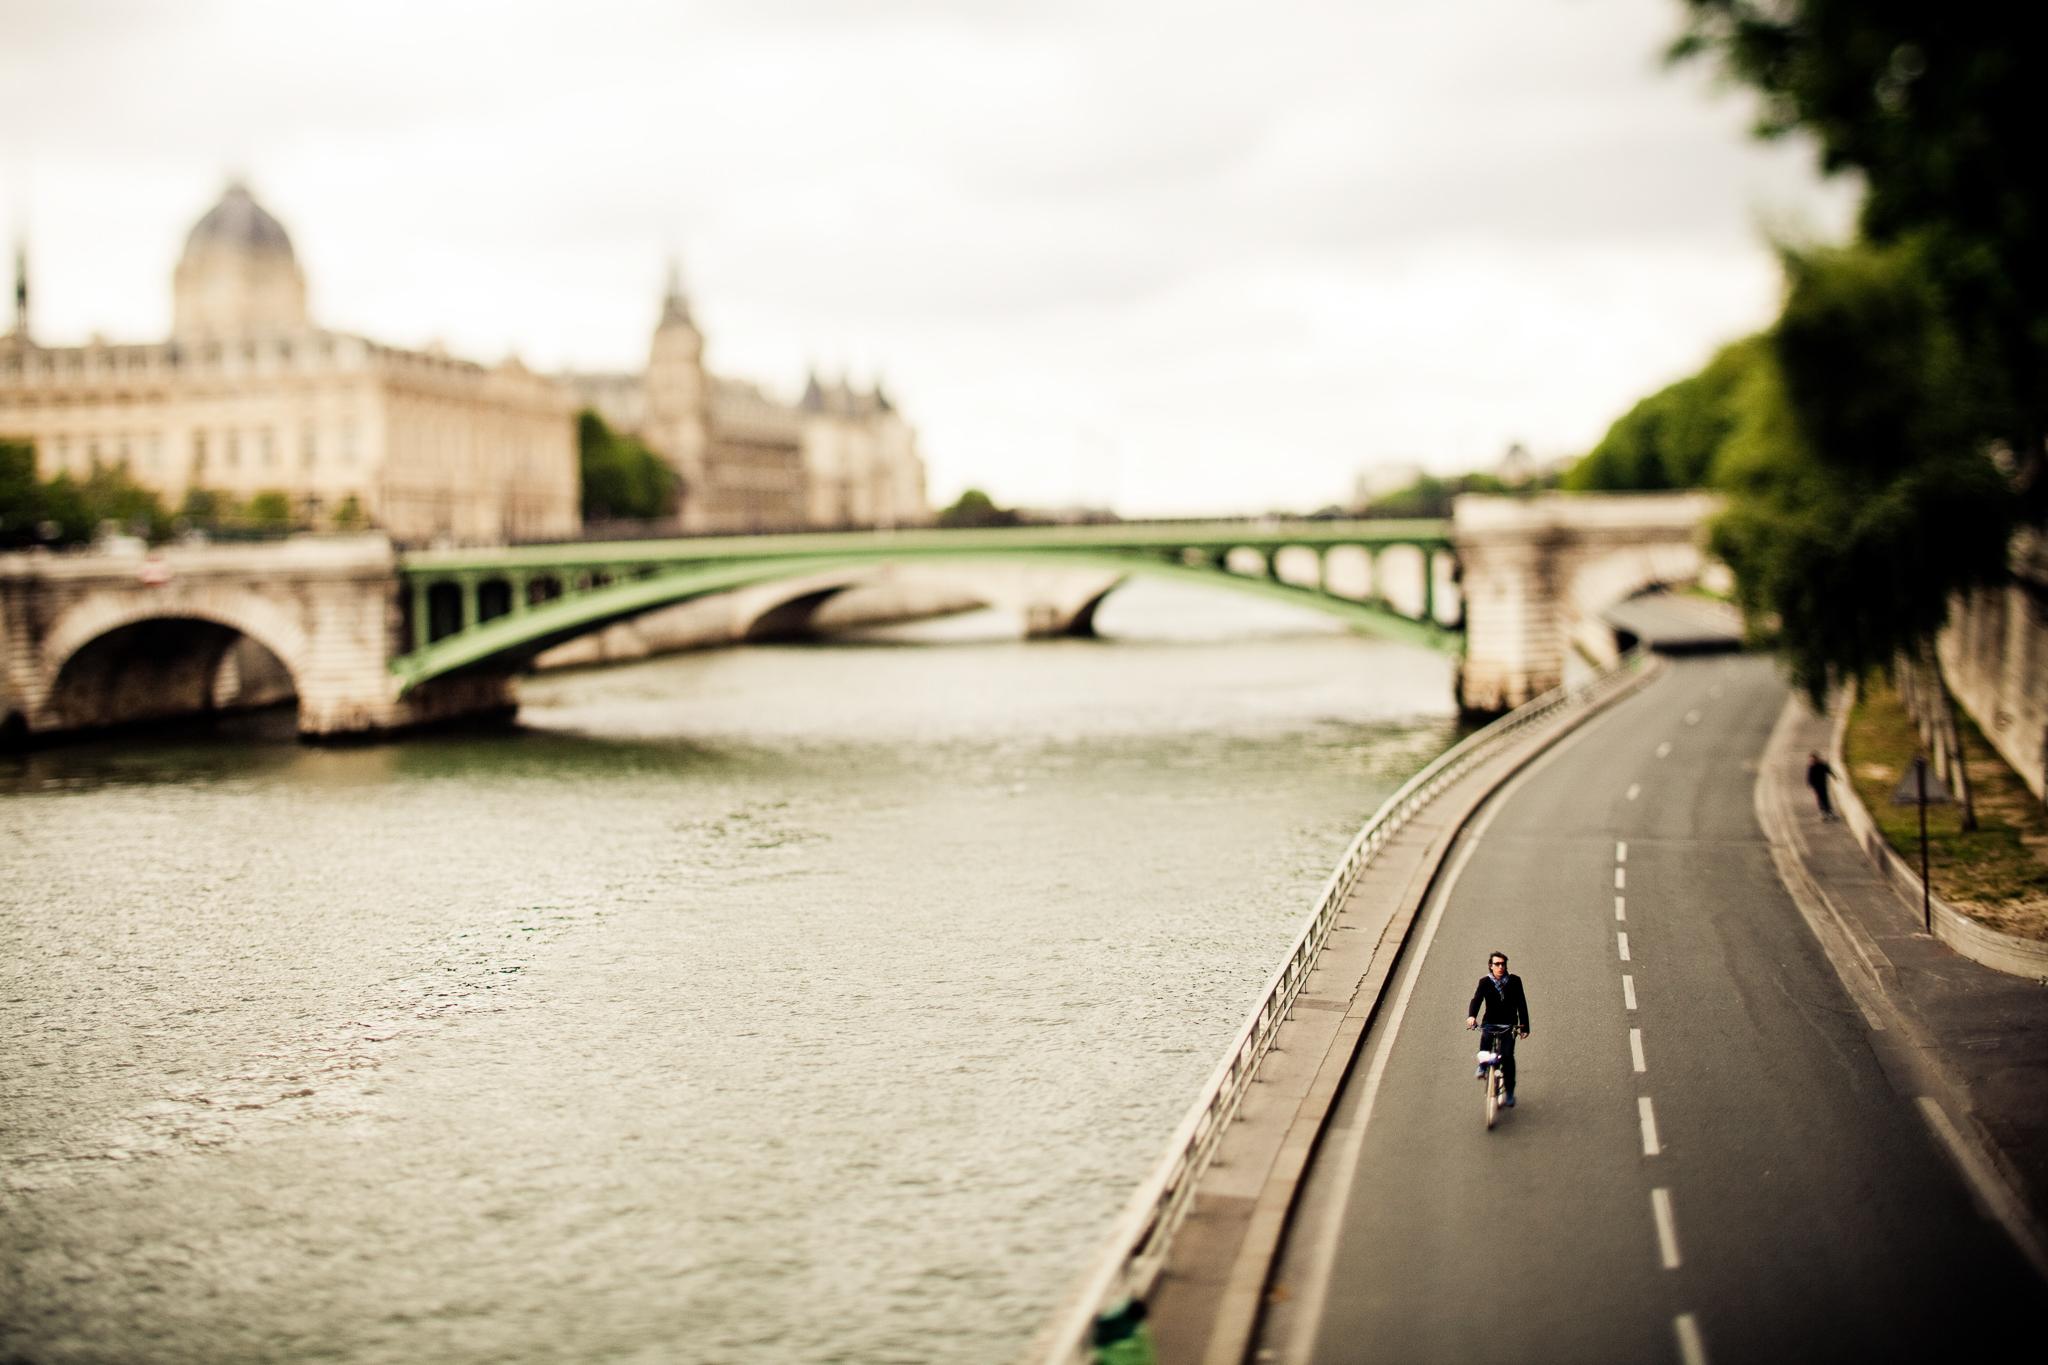 019_paris_rider.jpg